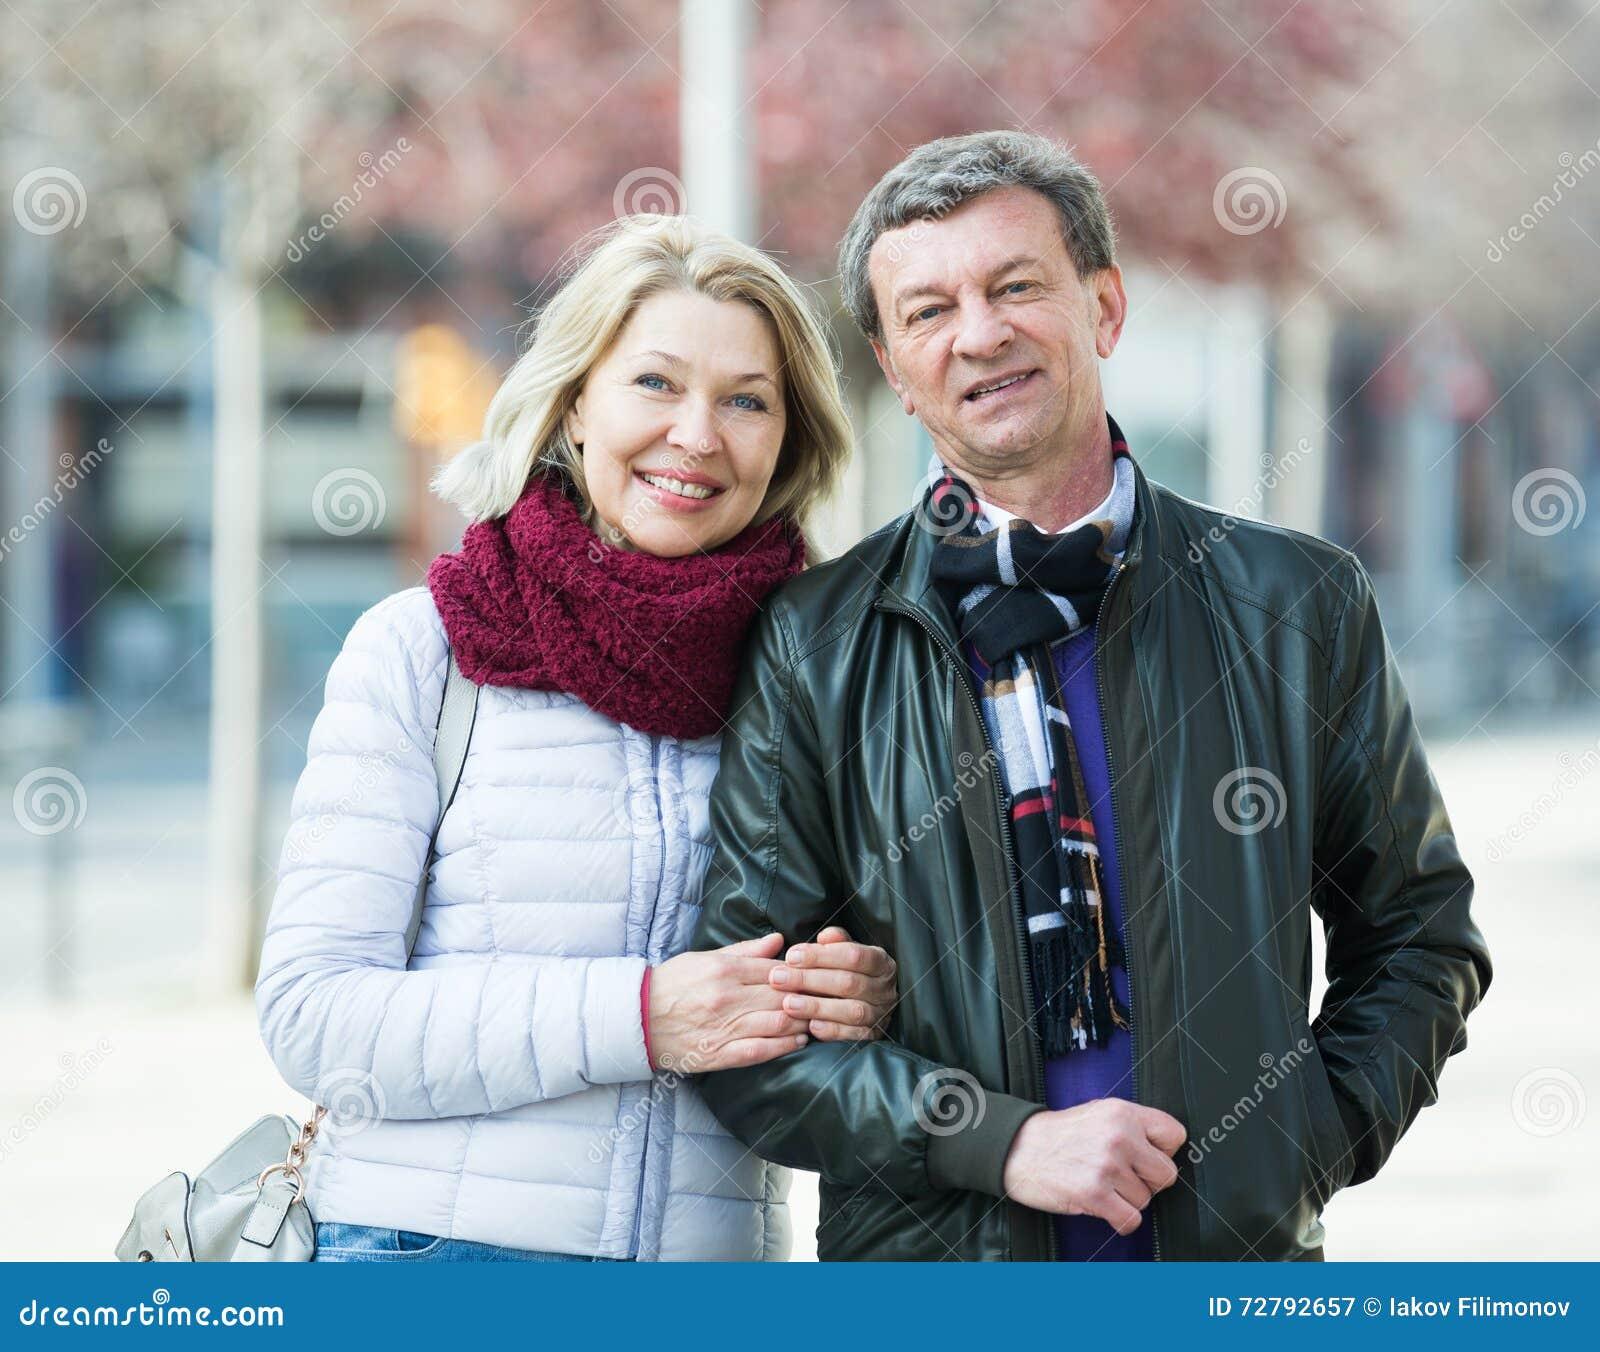 spring city senior dating site Meet lex: sweet senior (pa), a dog, at blind dog rescue alliance - tn on petfinder.